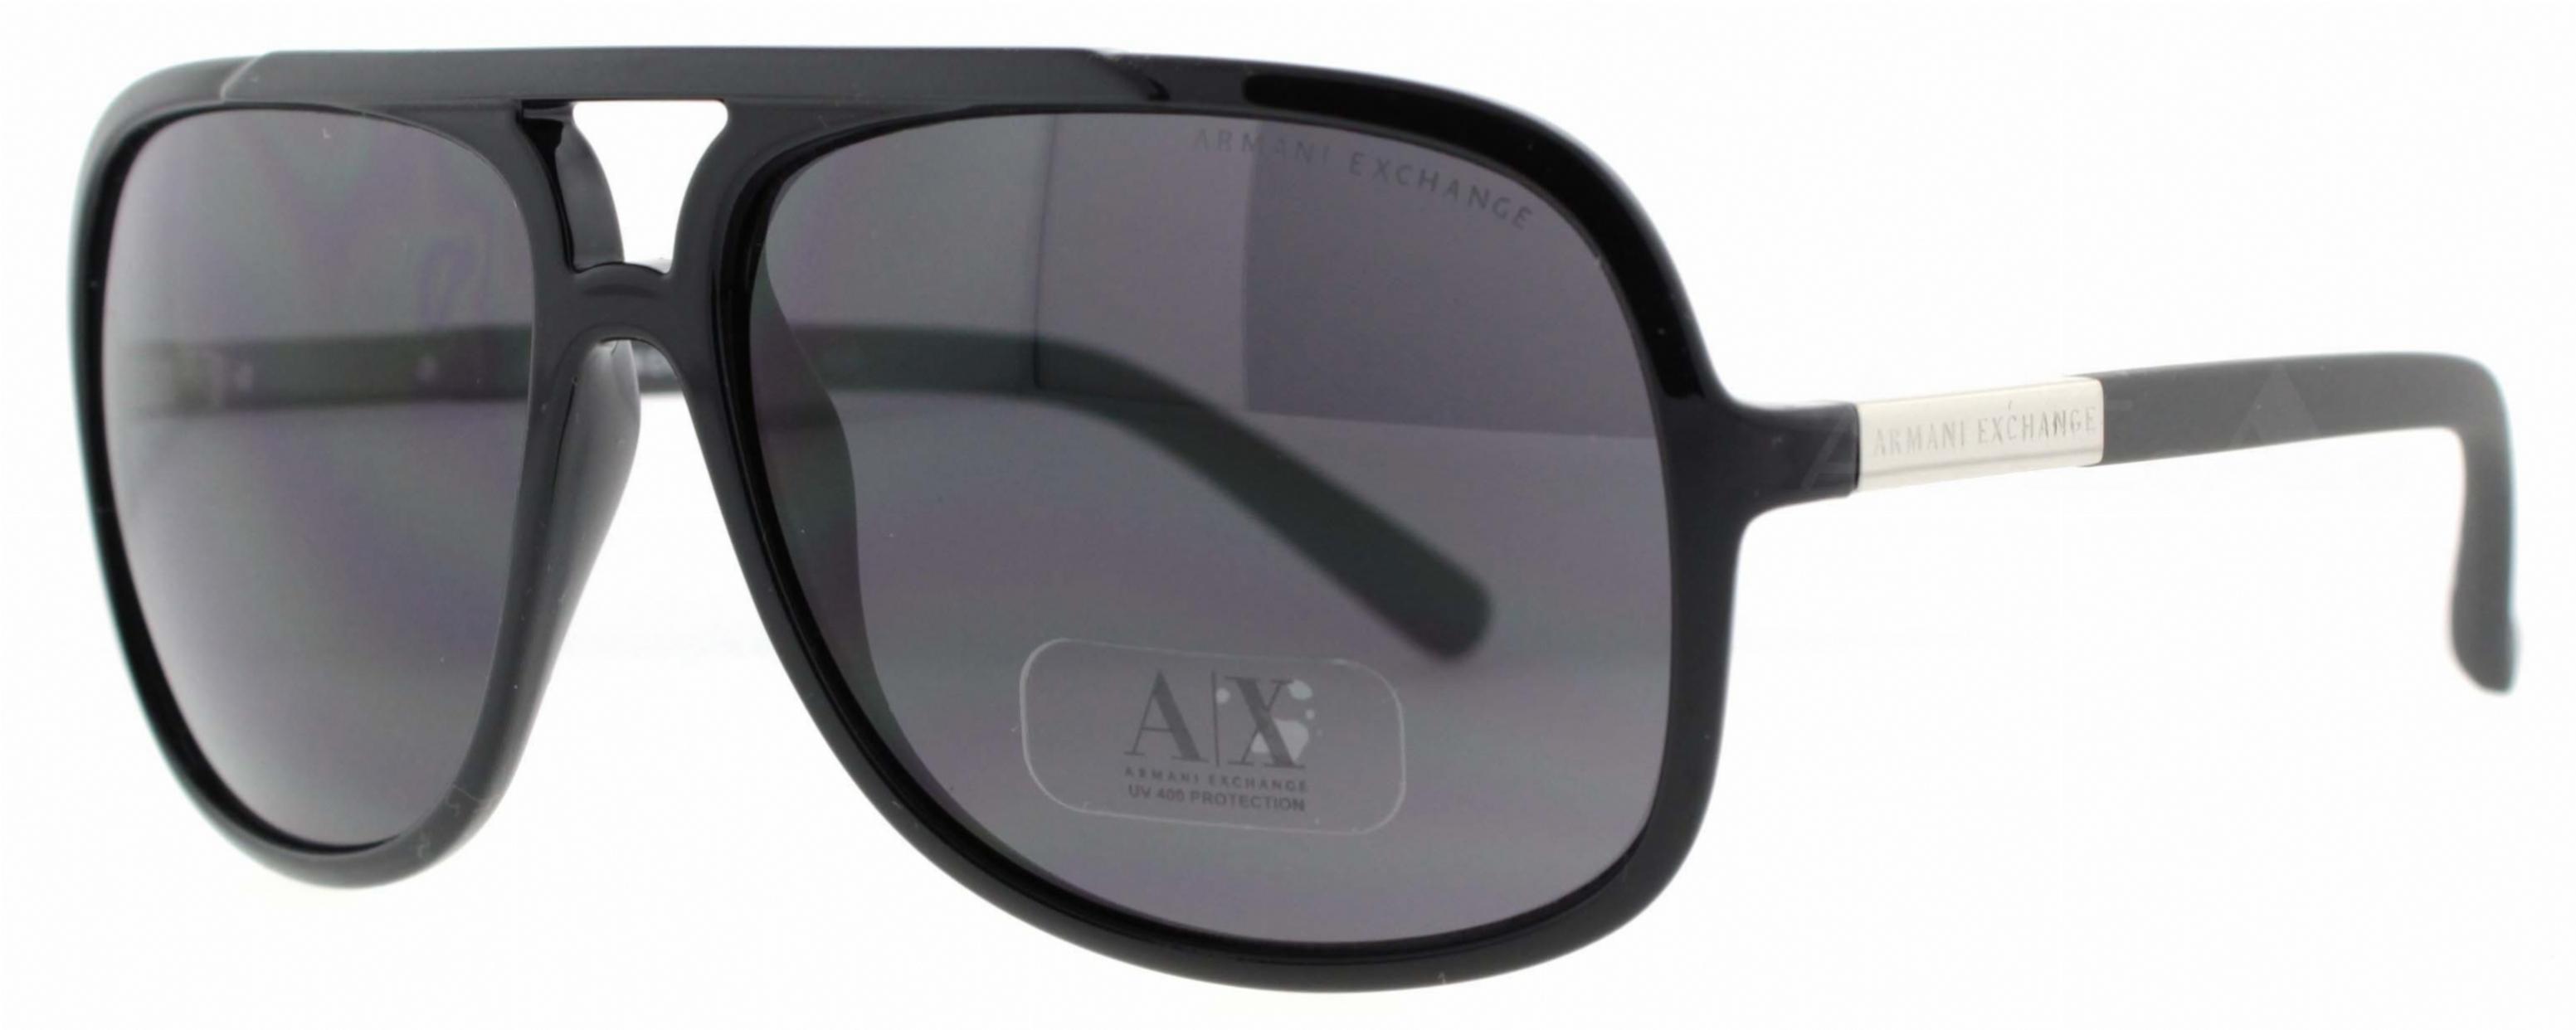 cheap armani exchange sunglasses  armani exchange 230